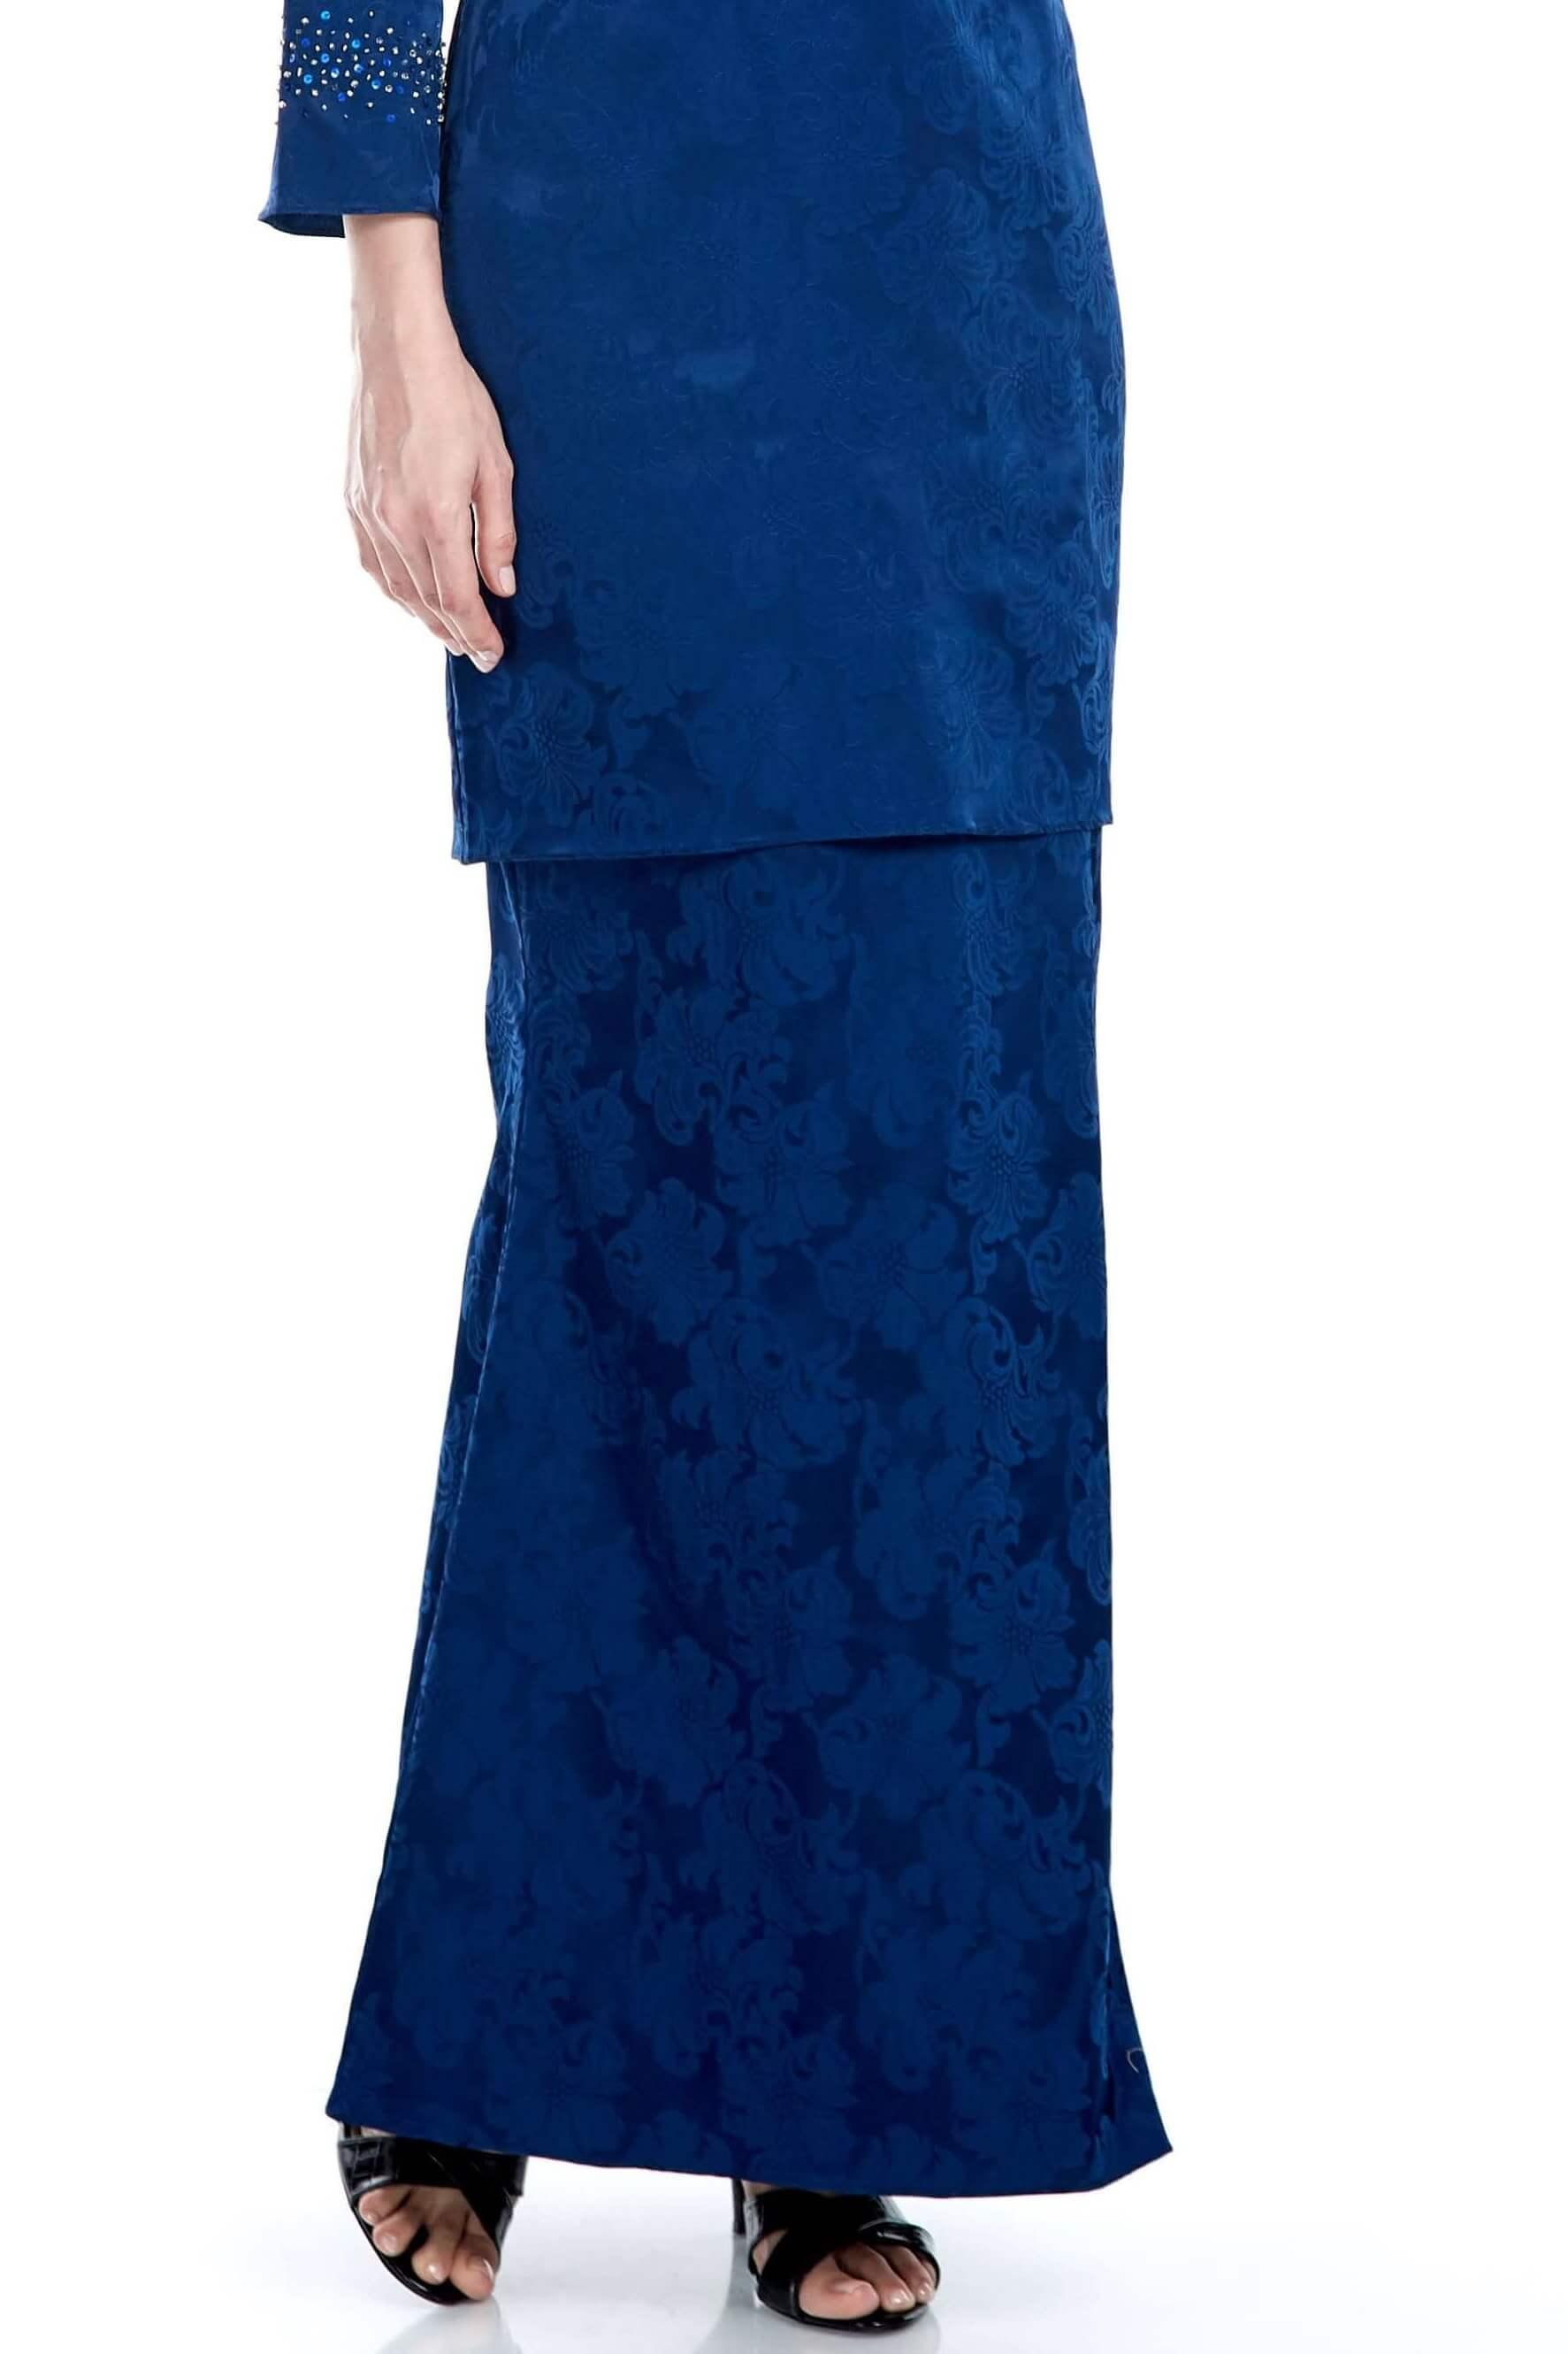 Navy Mermaid Skirt (7)